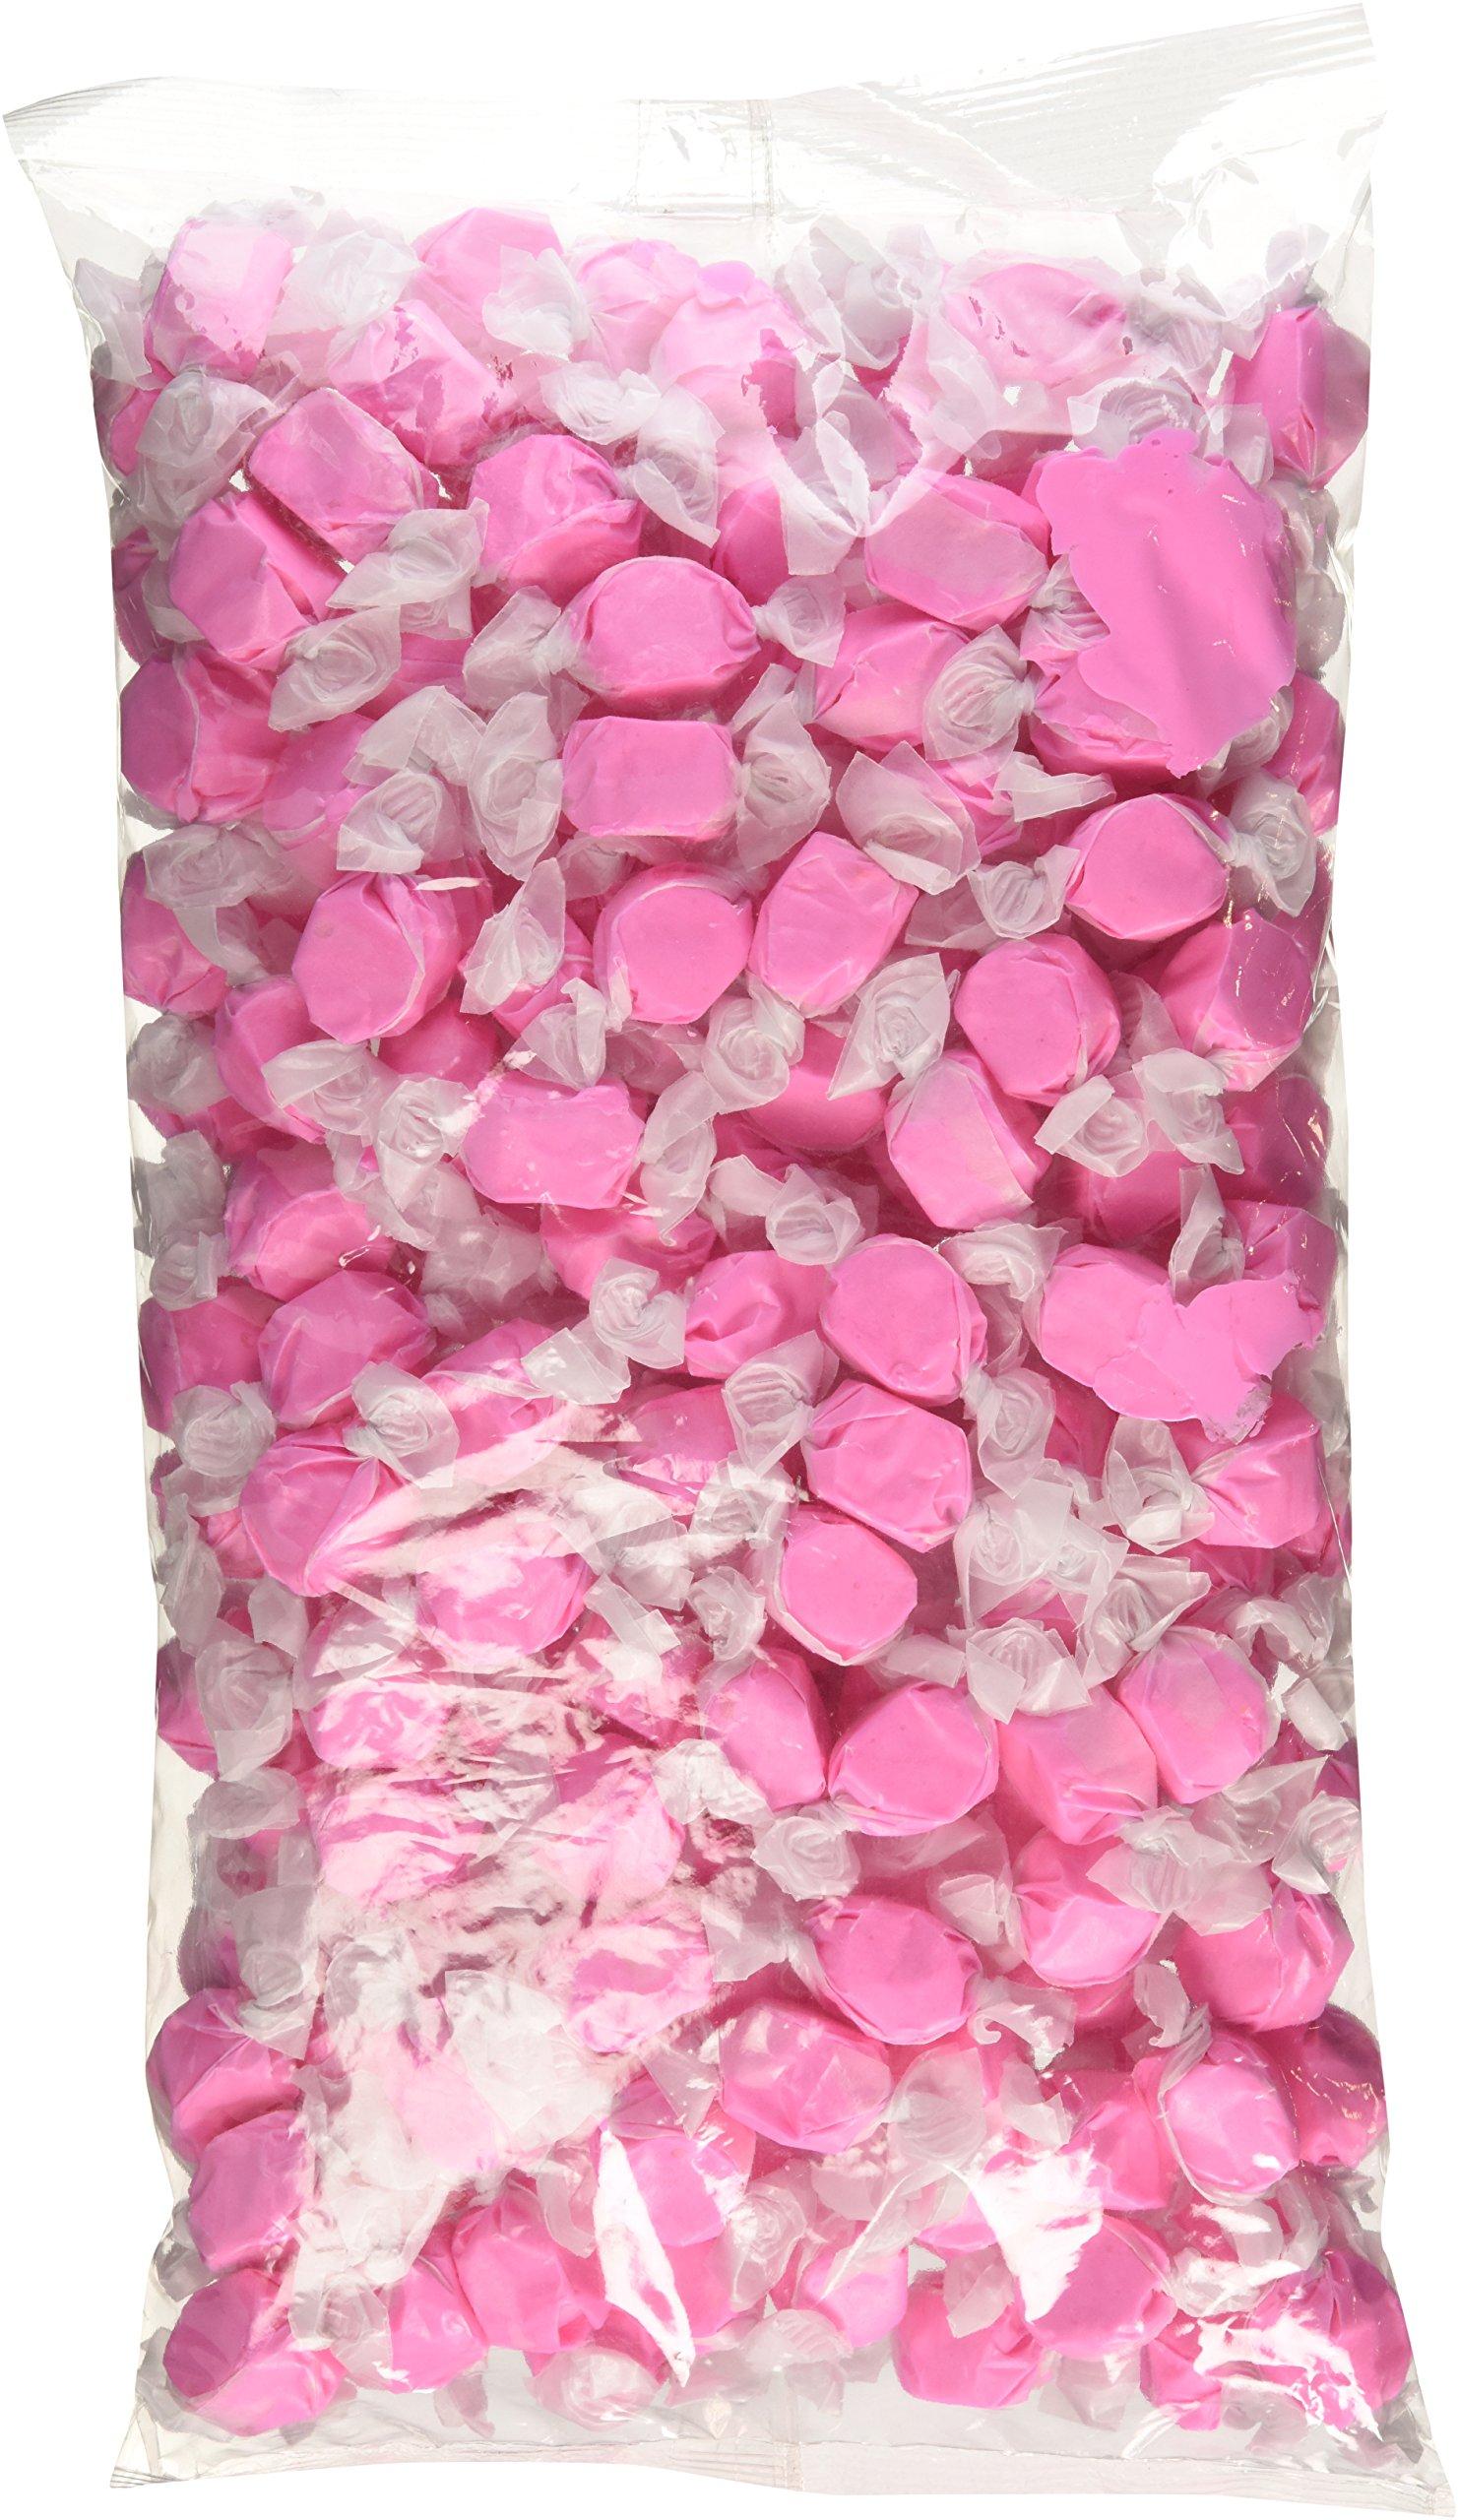 Sweets Salt Water Taffy, Pink Strawberry, 3 Pound